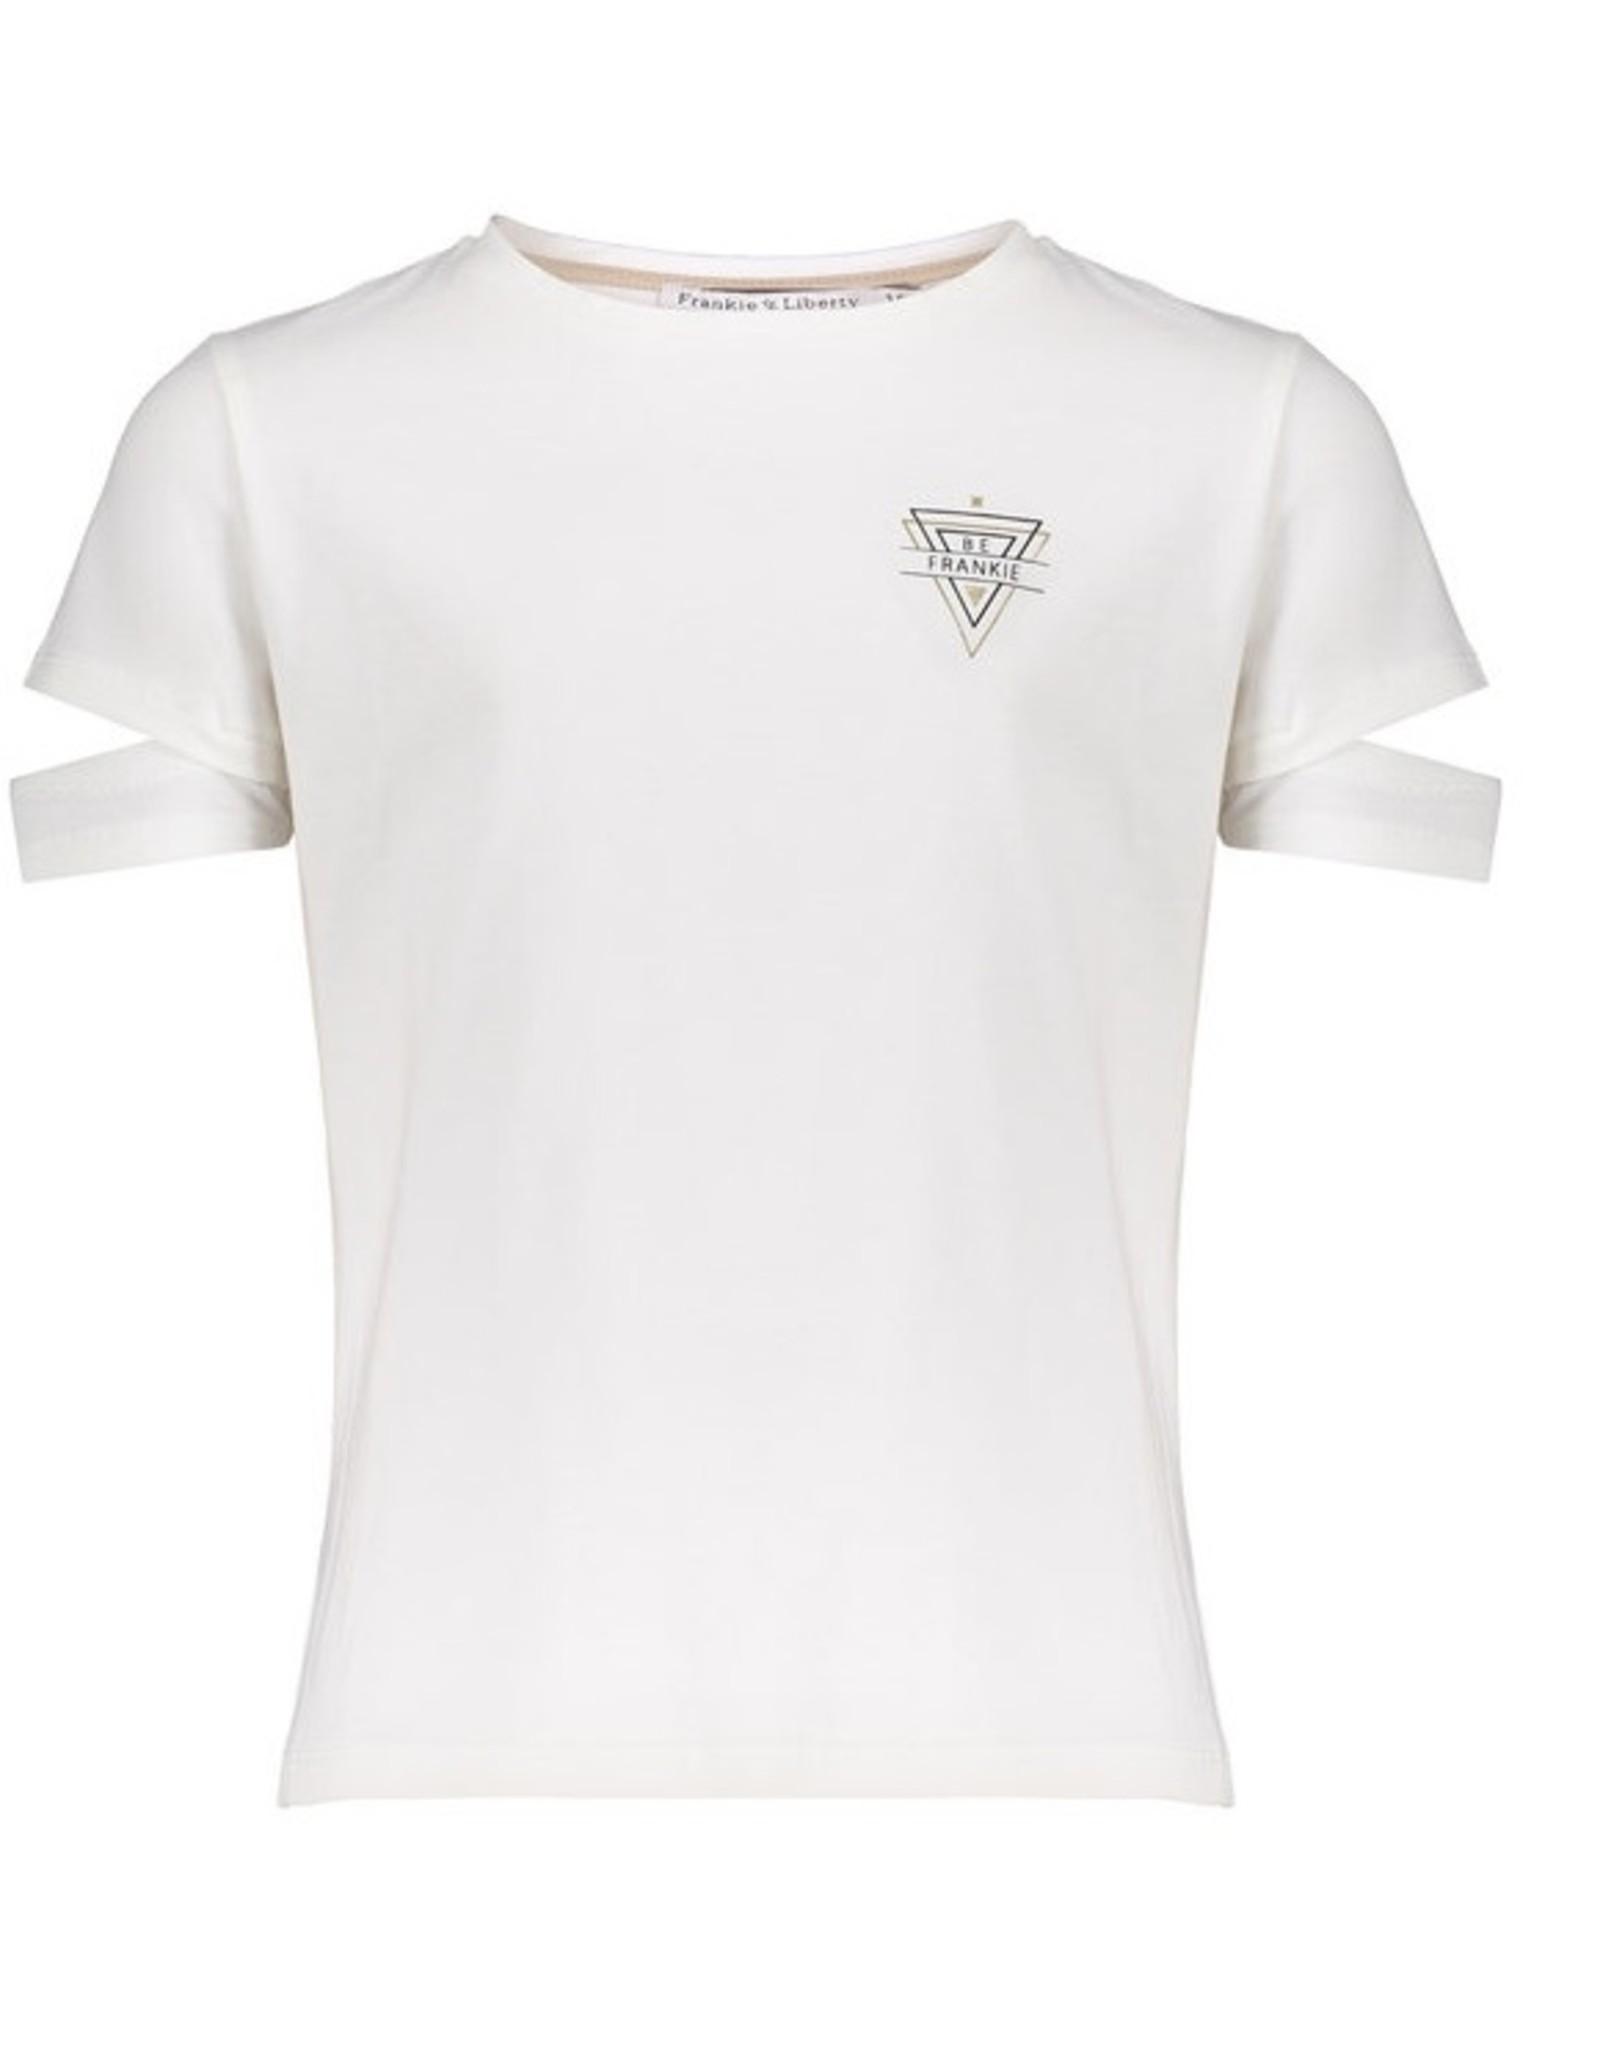 Frankie & Liberty Sienna T-Shirt